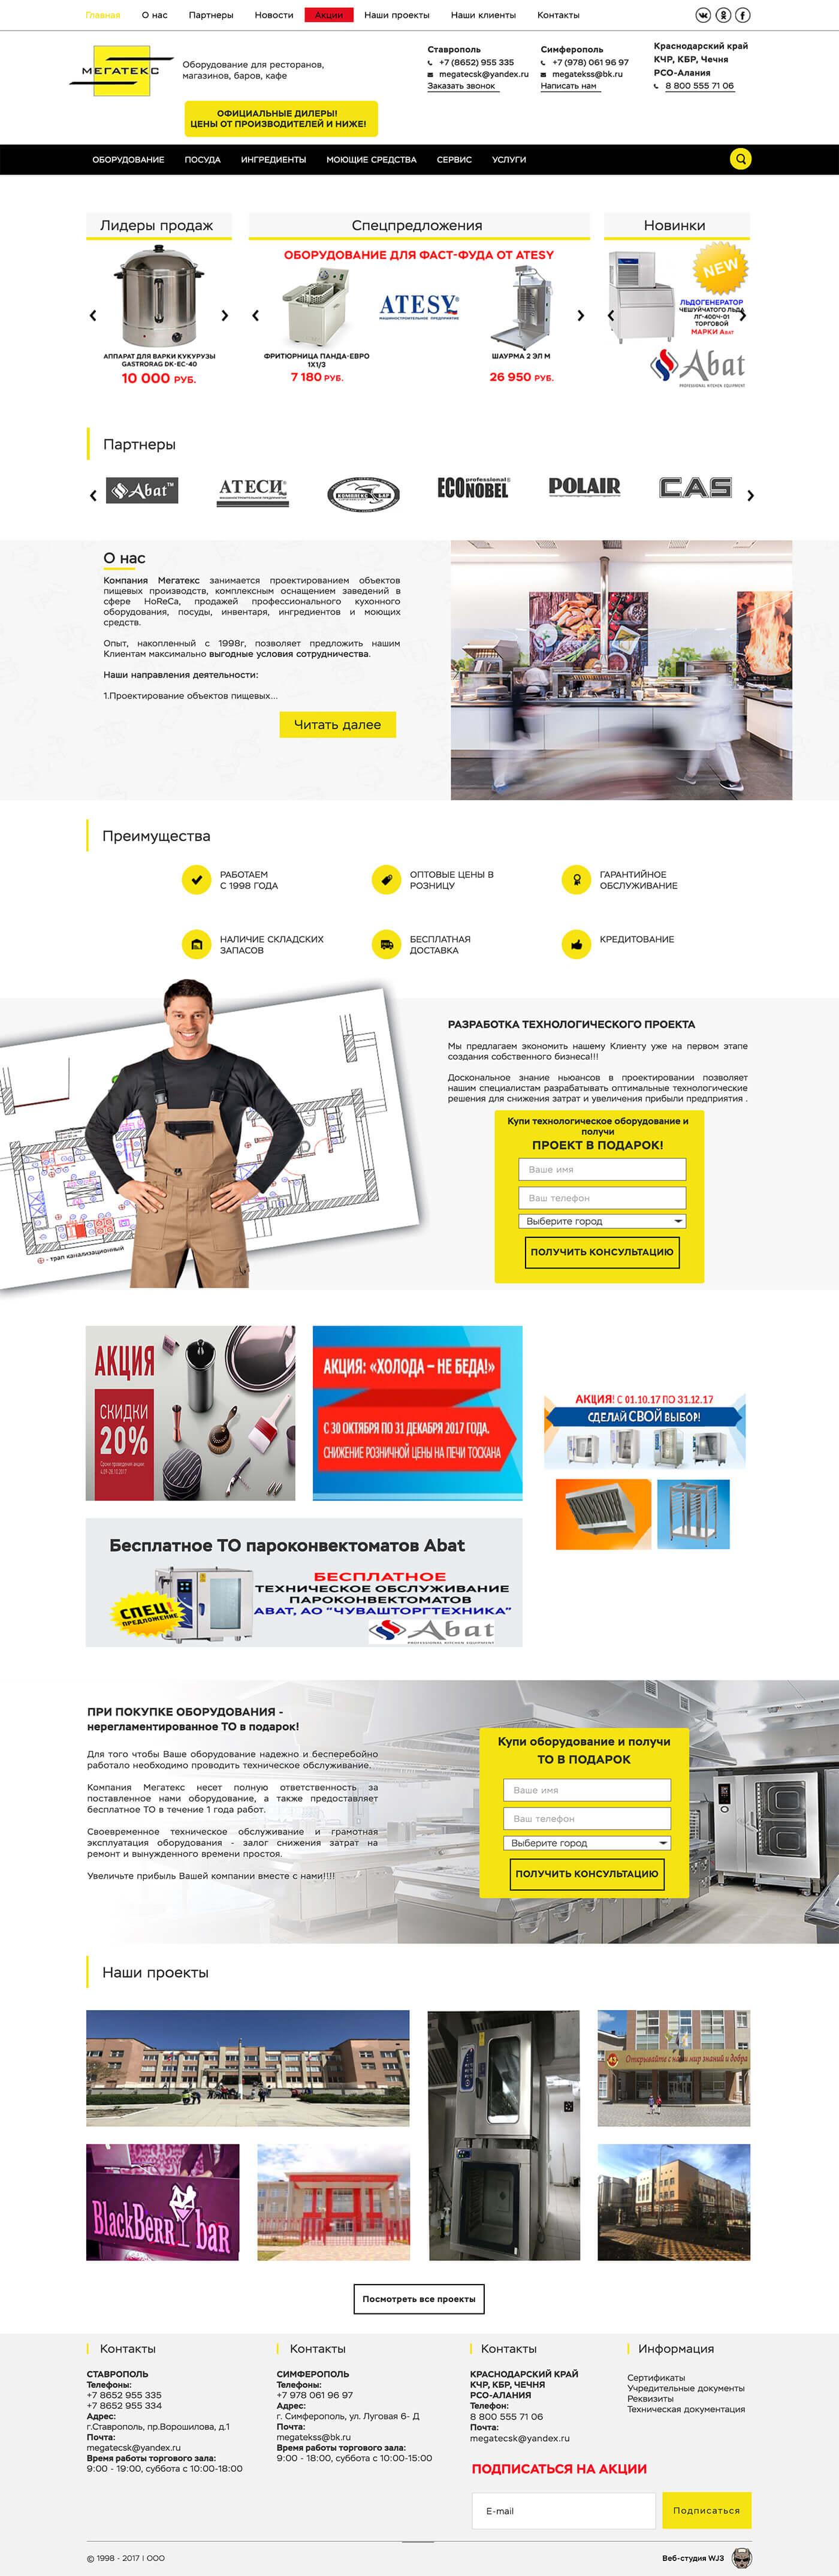 Сайт компании Мегатекс